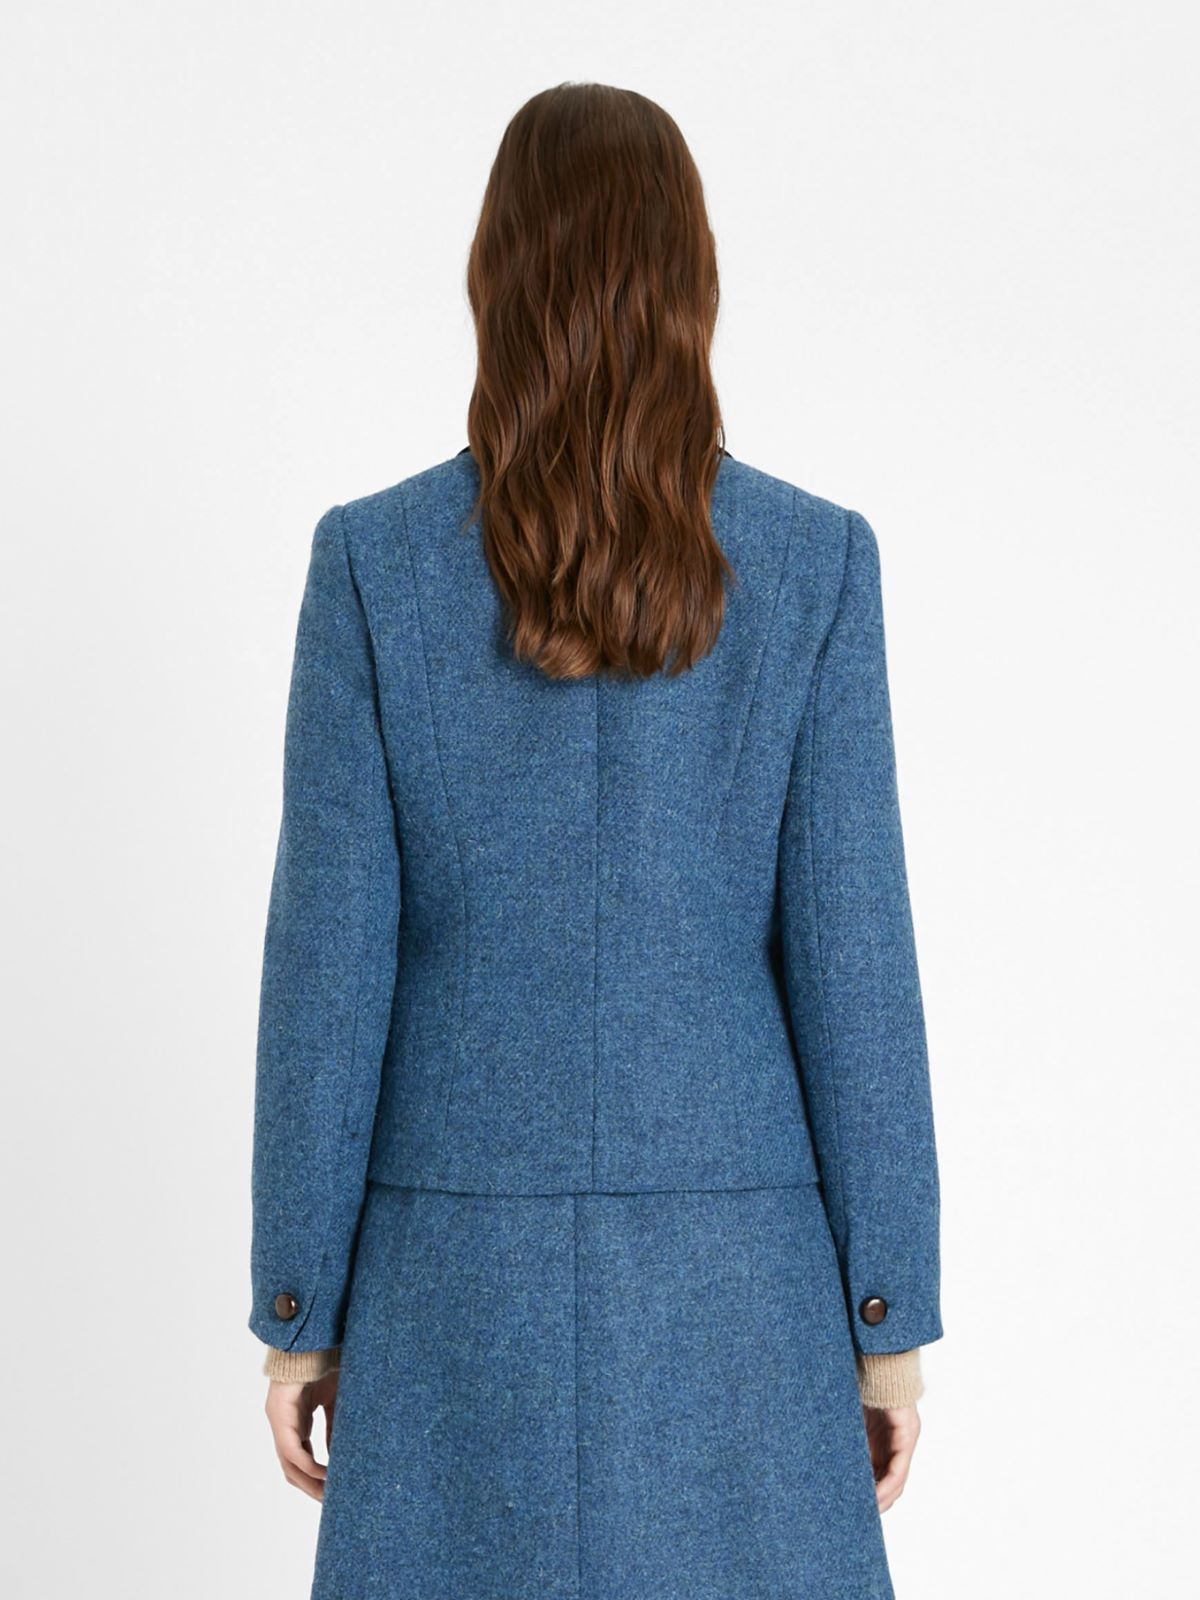 Harris Tweed wool jacket Weekend Maxmara